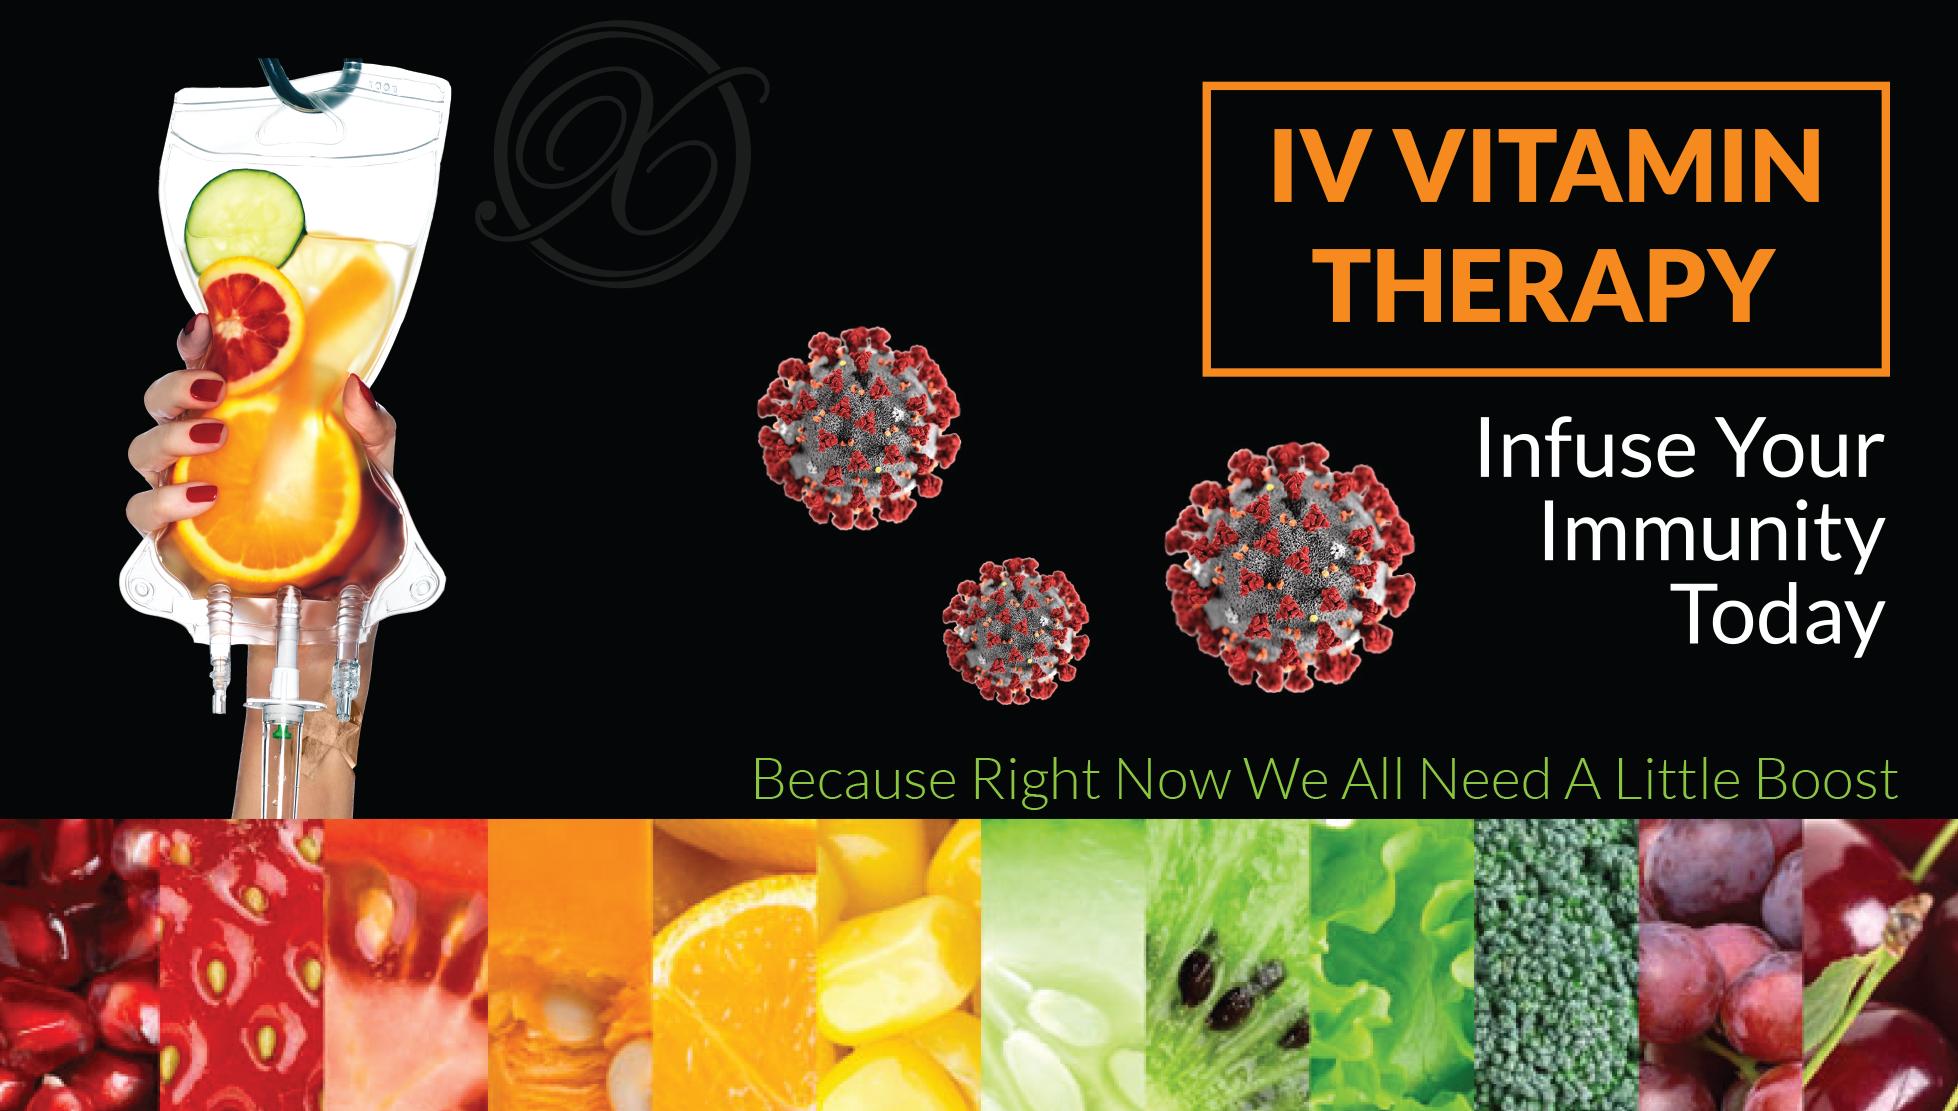 IV Vitamin Therapy at Xanadu Med Spa